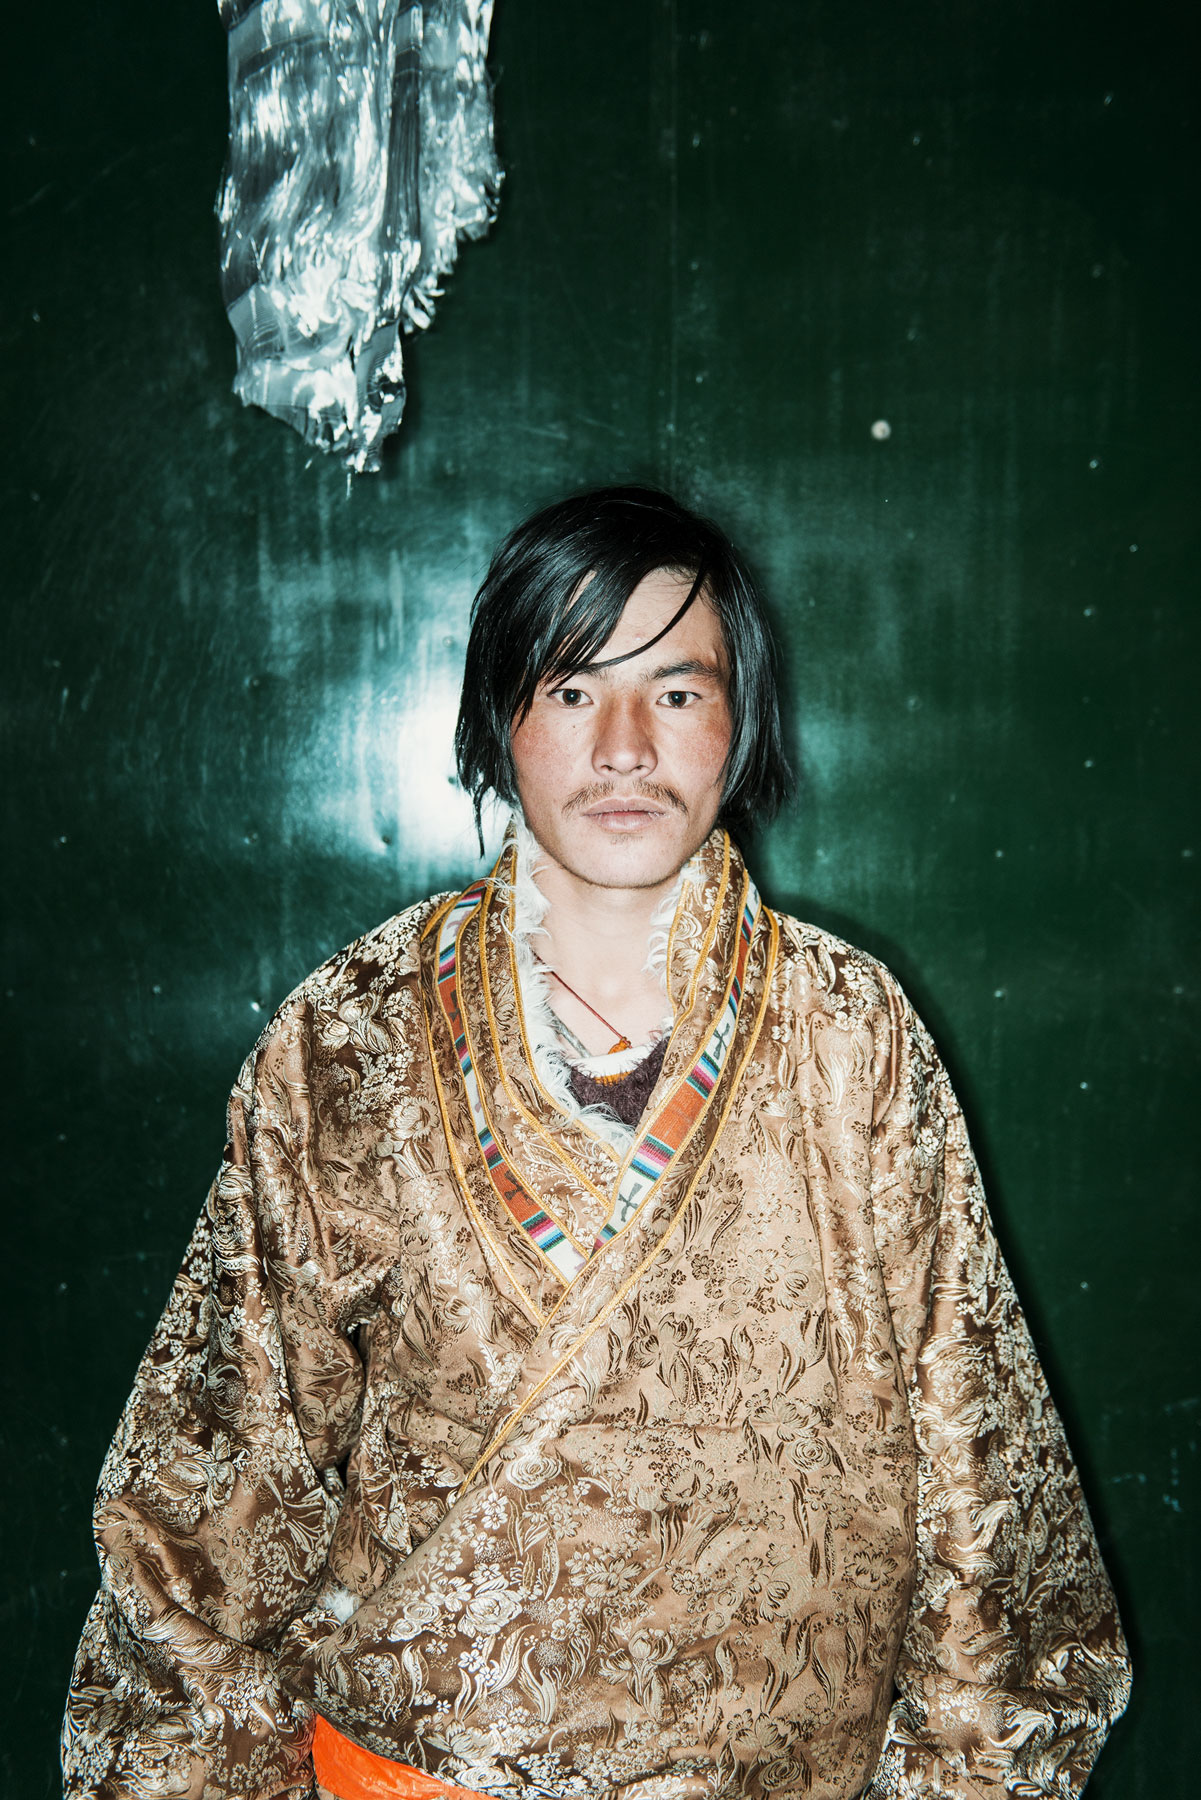 amdo-lhasa-pilgrim-cool-moustache.jpg